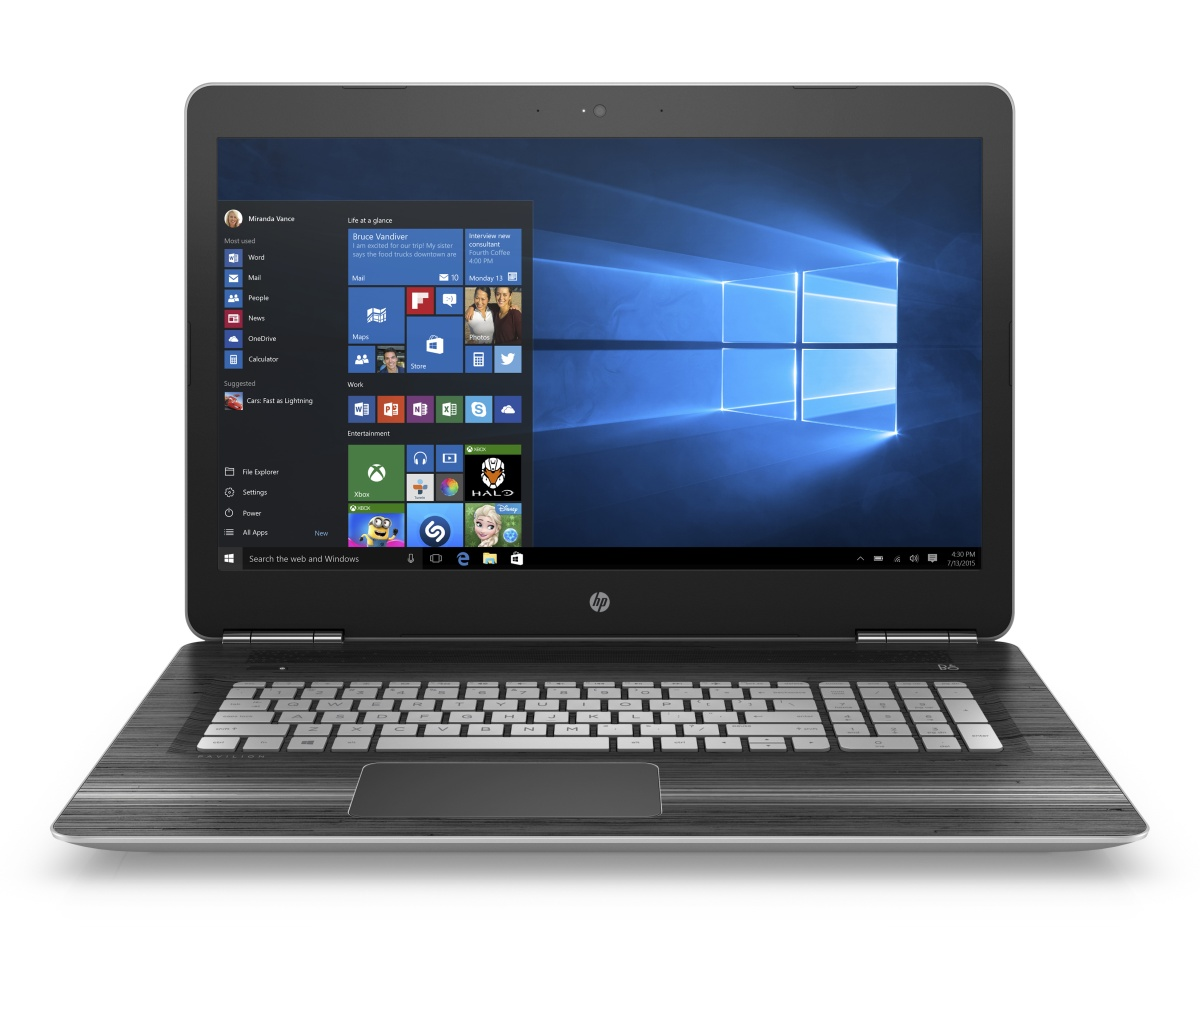 "HP Pavilion gaming 17-ab201nc/Intel i7-7700HQ/8GB/128 GB SSD M.2 + 1TB/DVDRW/ GTX 1050 4GB/17,3"" FHD/Win 10/stříbrná"